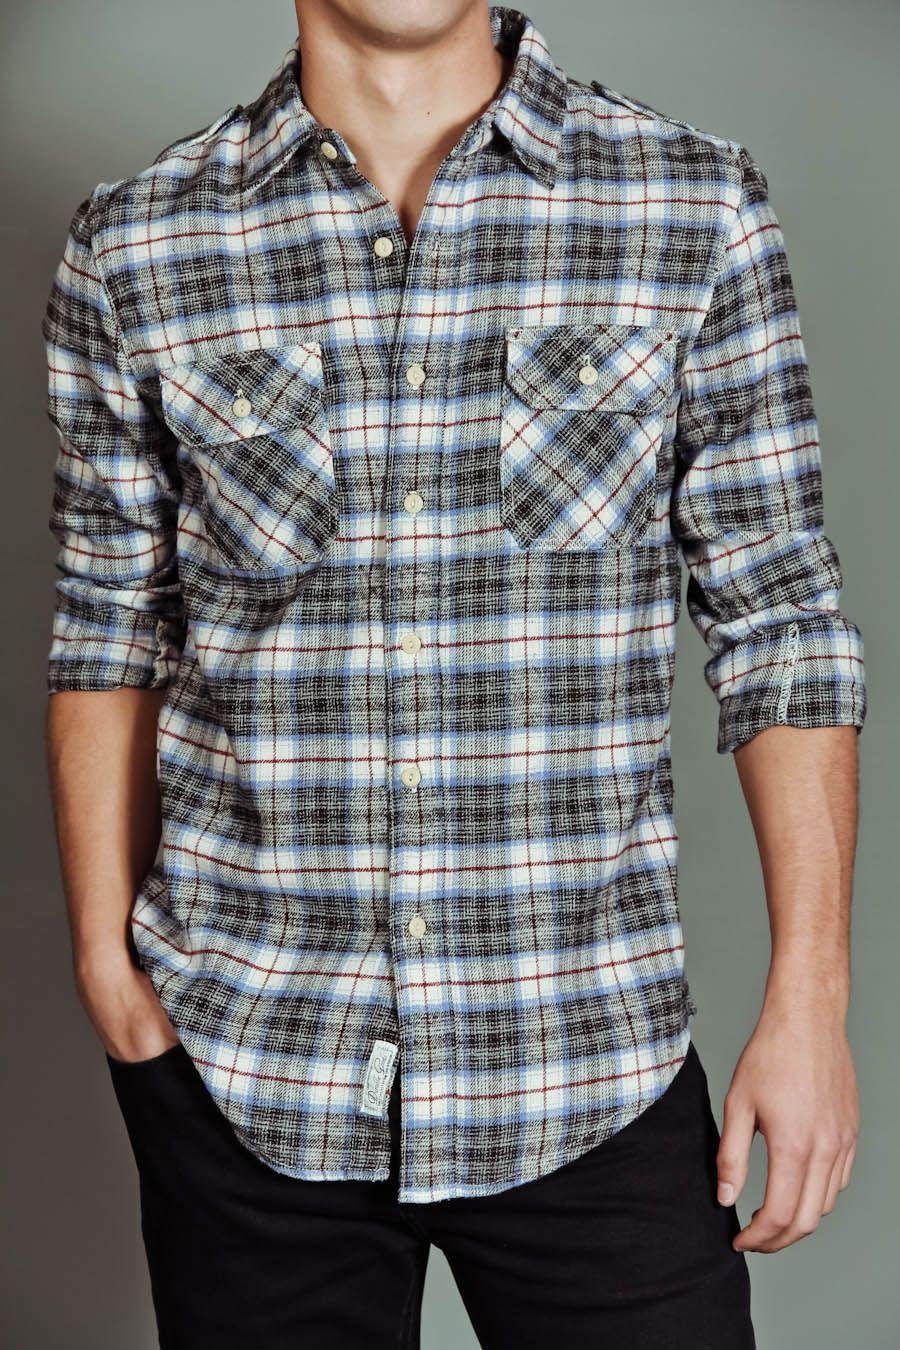 Flannel shirt men outfit  OTB Mill Valley LS Shirt Blue  Ikuzo  Pinterest  Flannels Guy